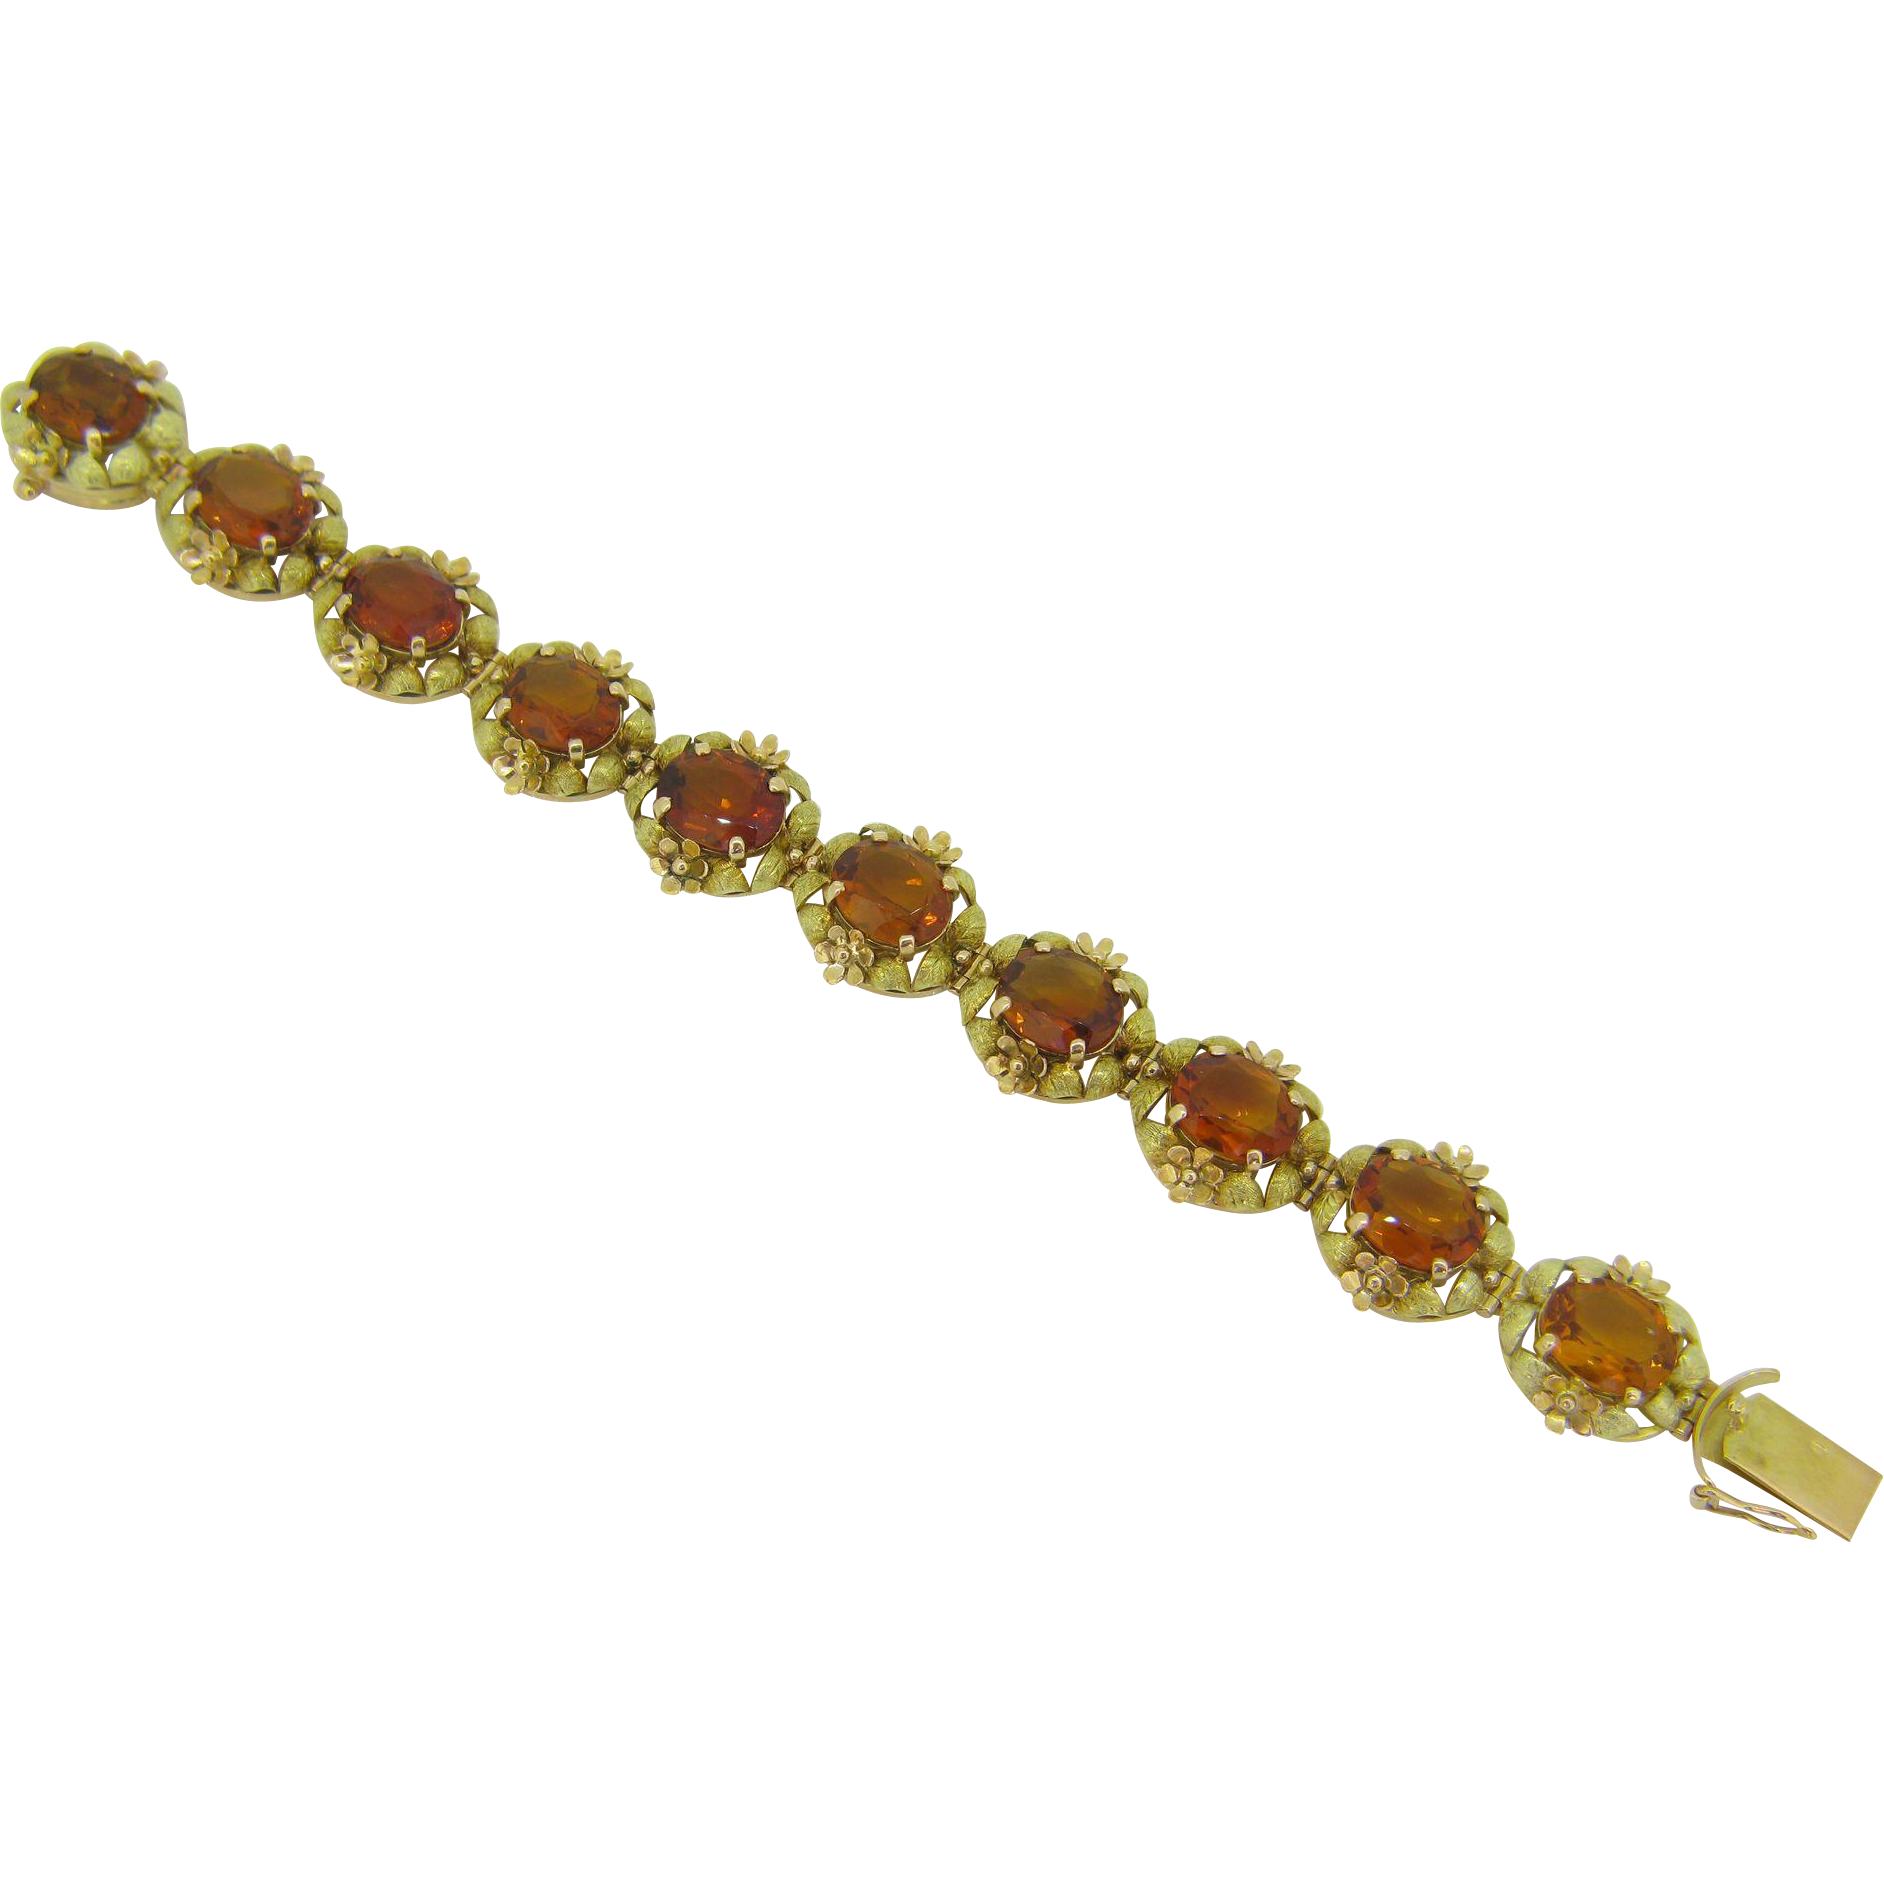 Stunning Victorian Citrine bracelet, 18kt gold, c.1880